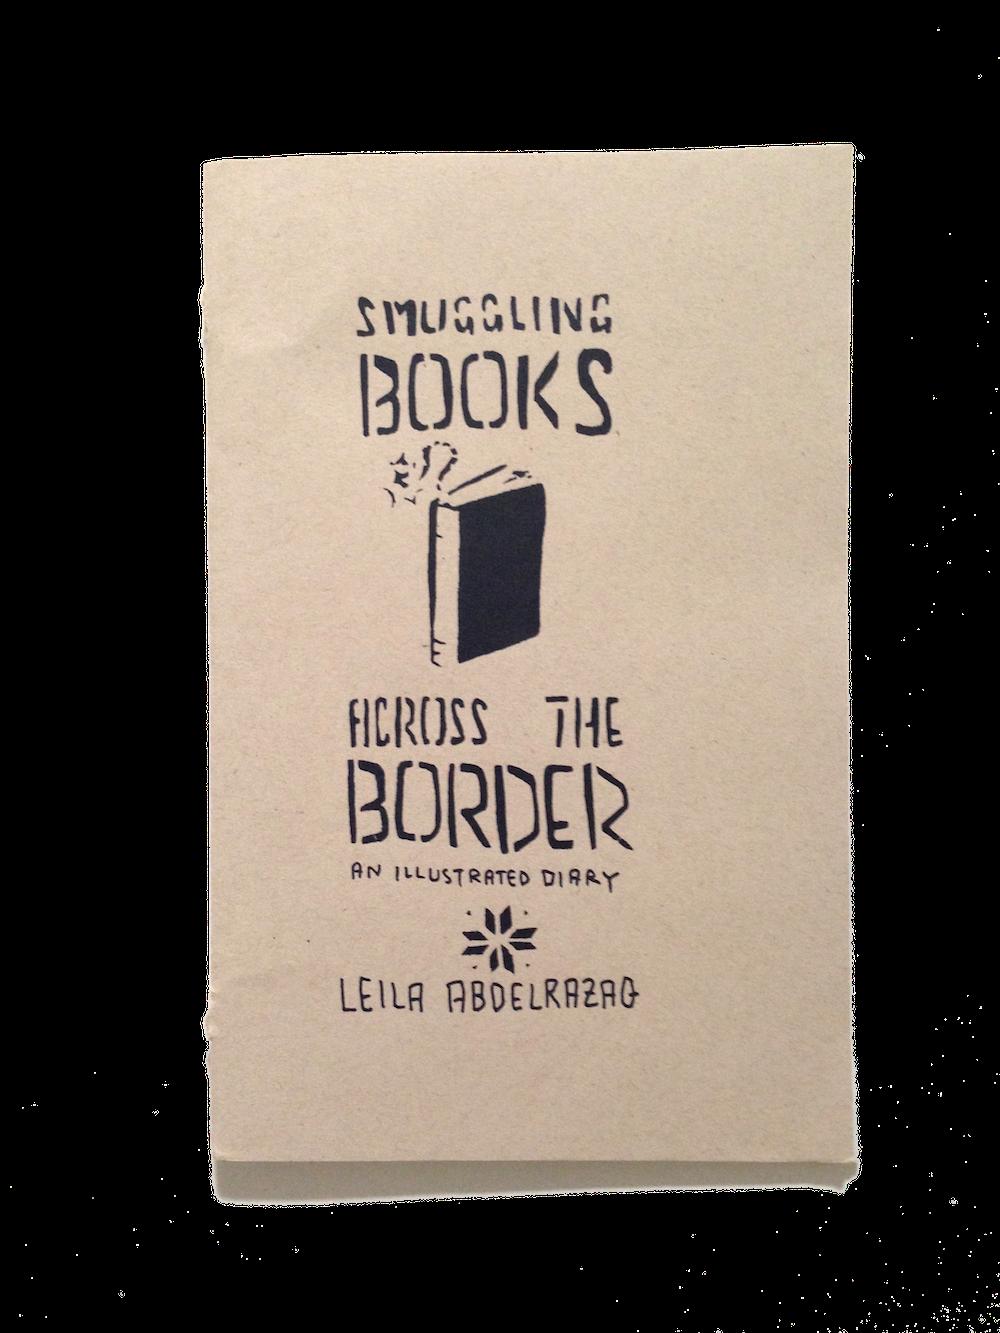 Smuggling Books Across the Border